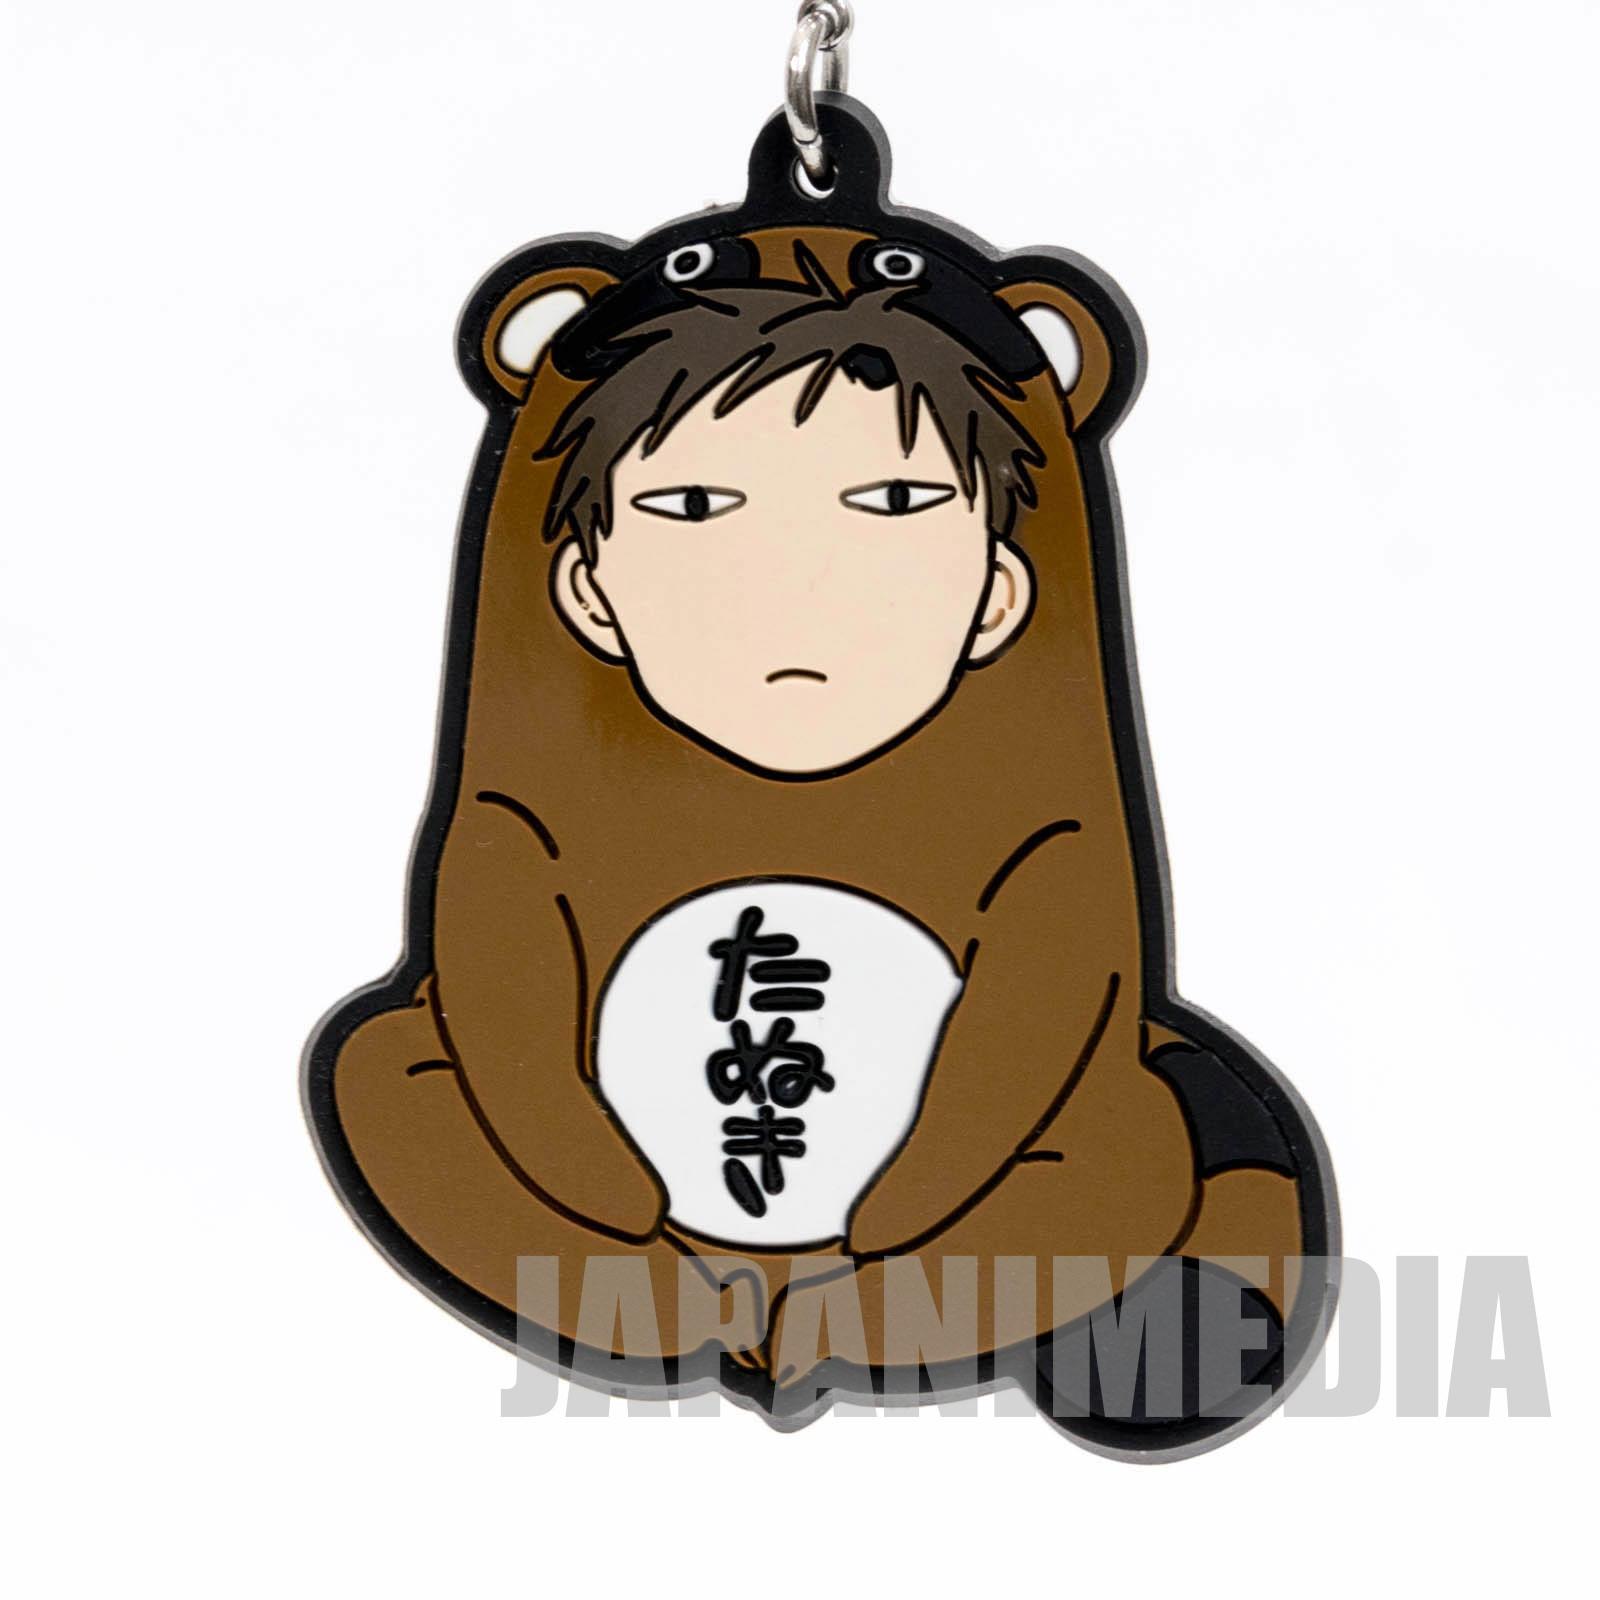 Monthly Girls' Nozaki-Kun Tanuki-kun (secret ver.) Rubber strap collection JAPAN ANIME MANGA